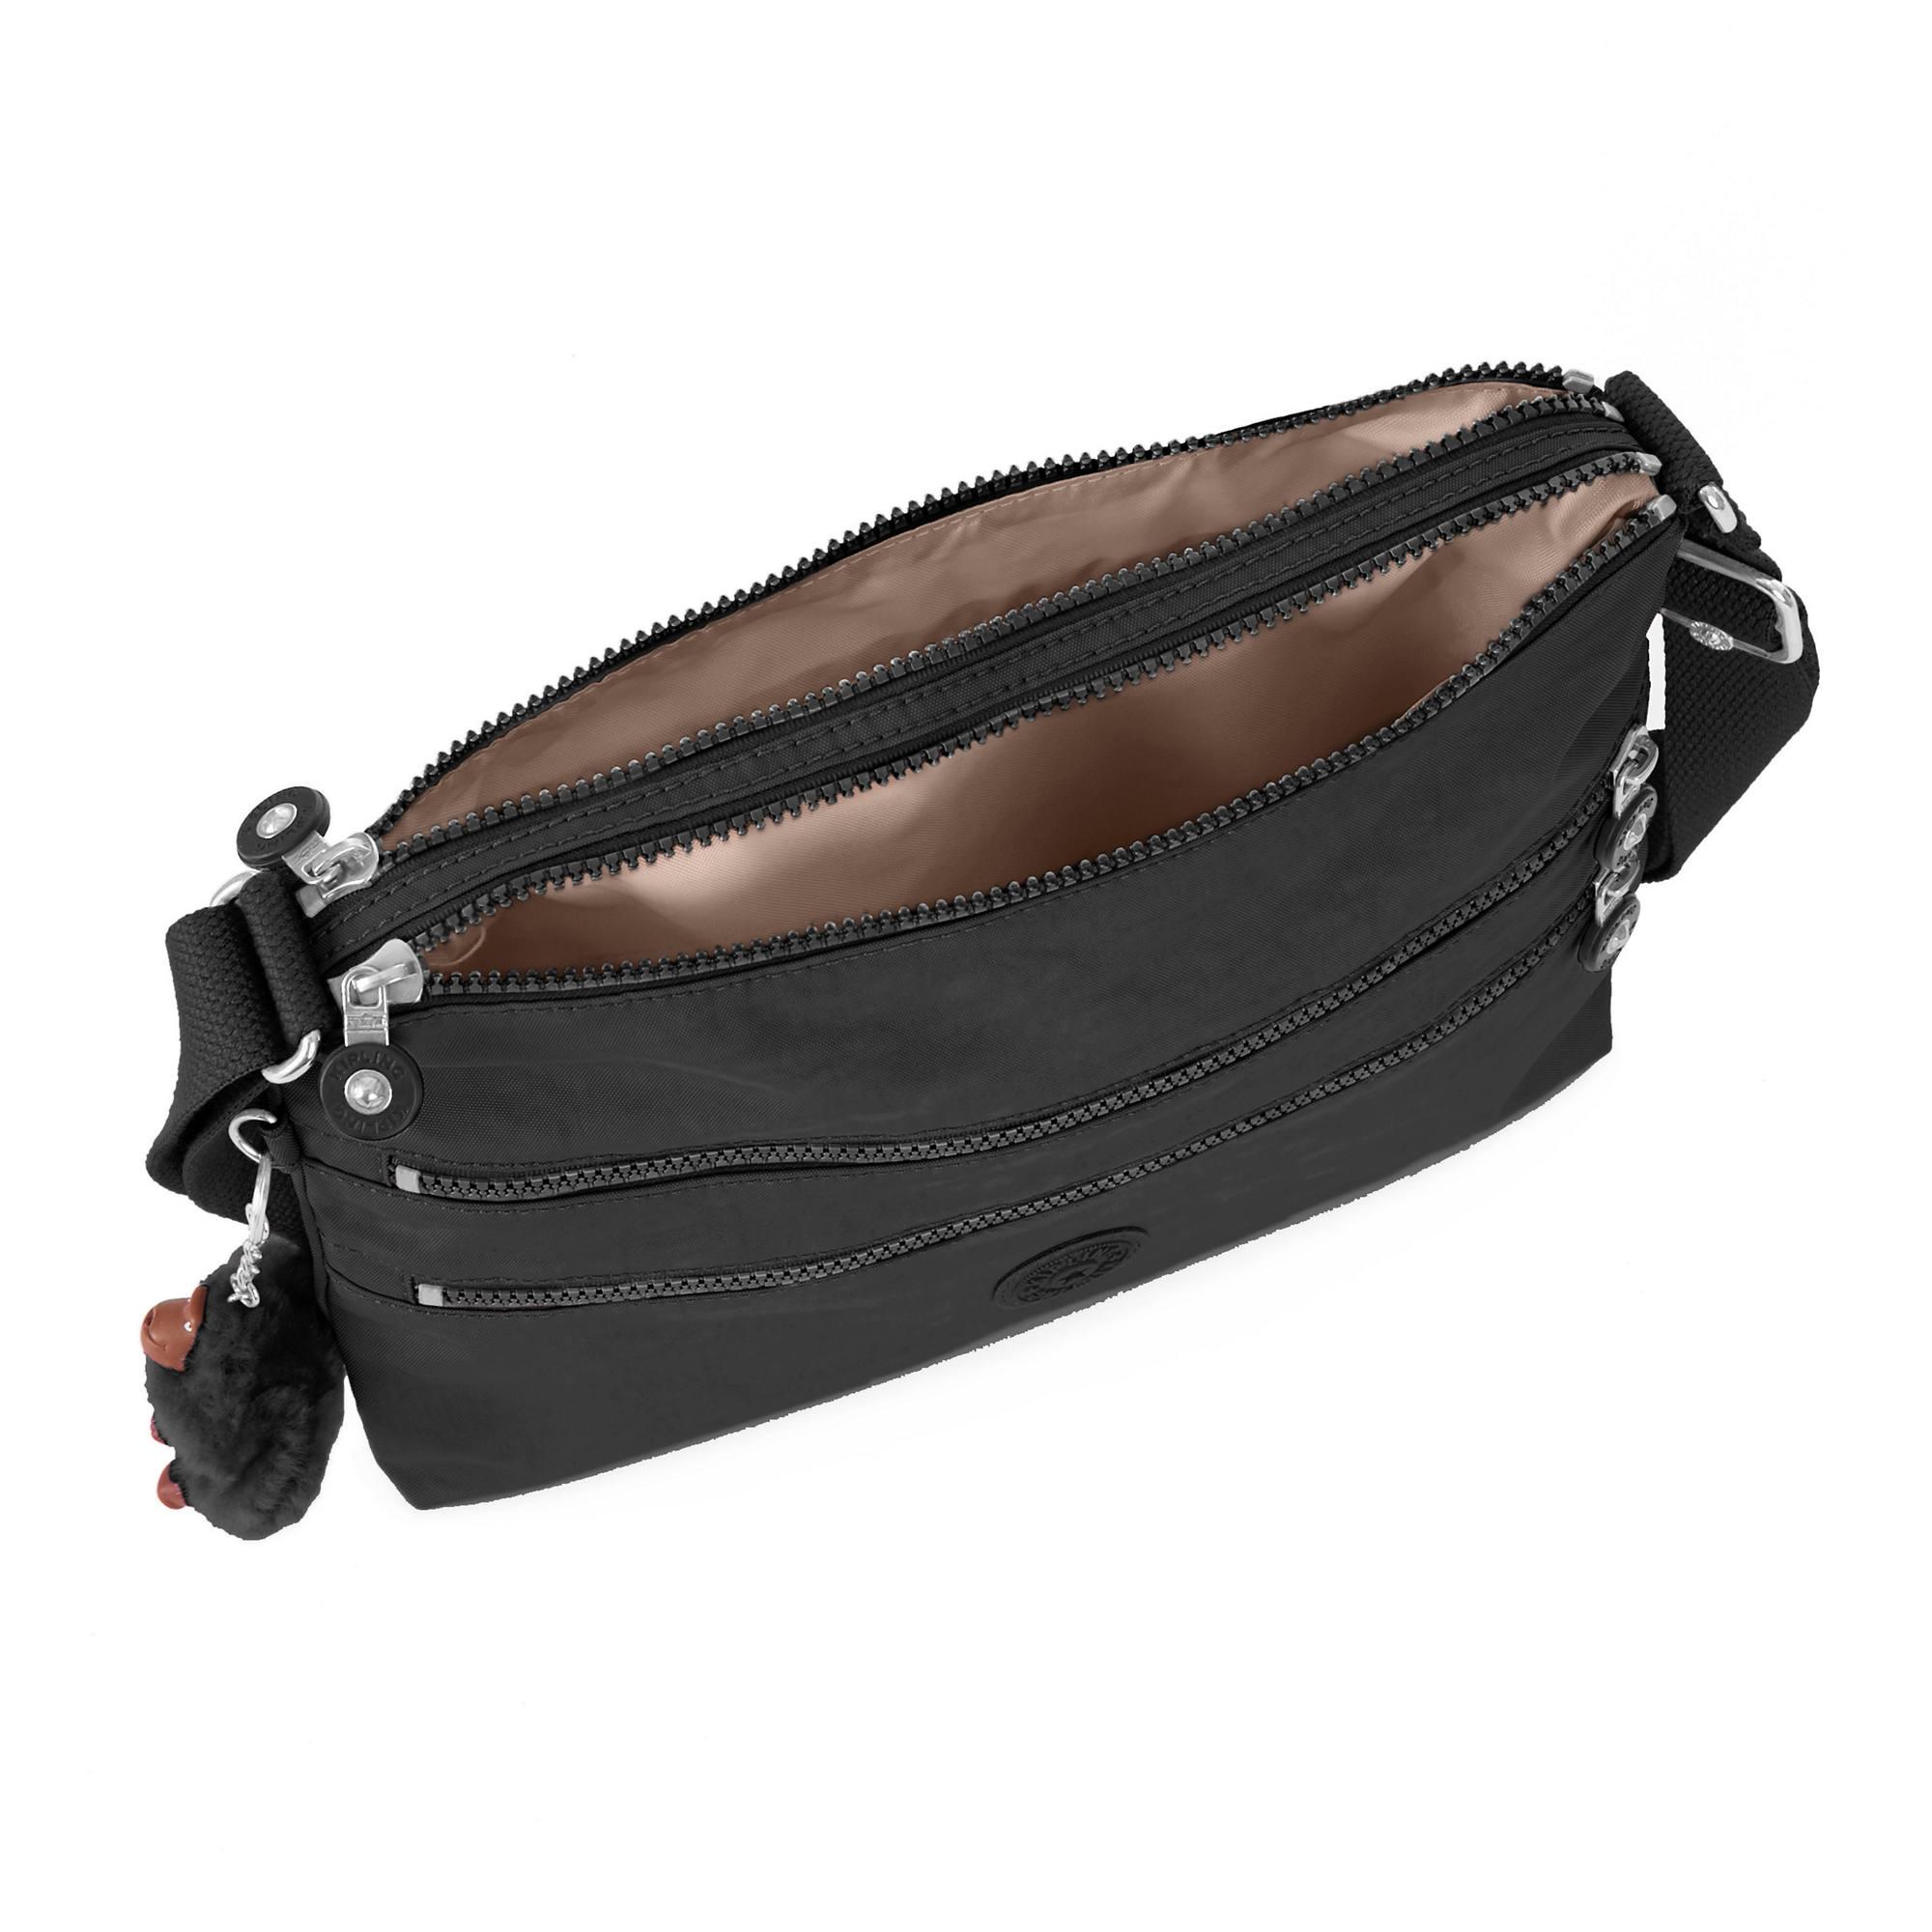 Kipling-Alvar-Metallic-Crossbody-Bag miniature 9